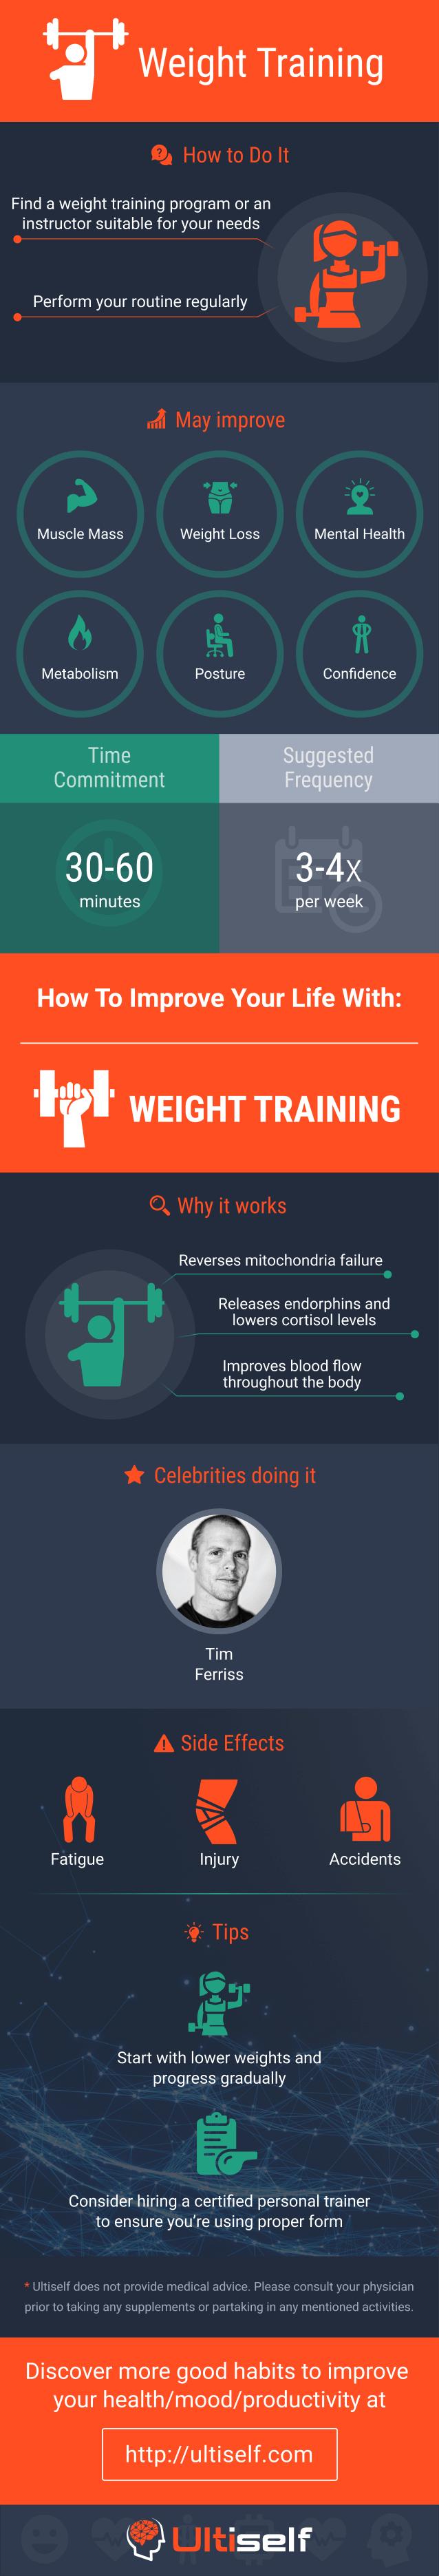 Weight Training infographic